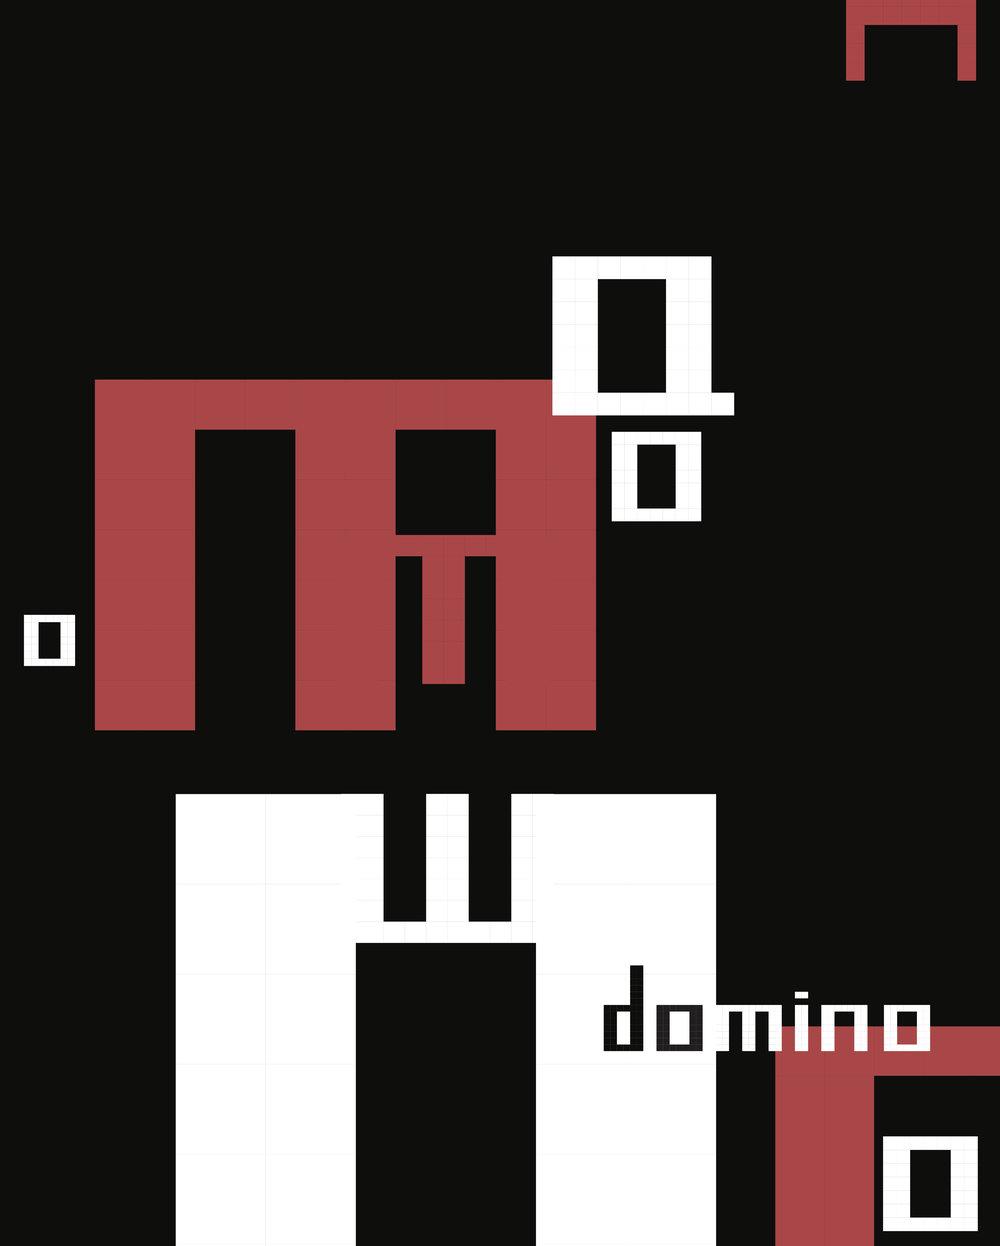 domino_poster.jpg